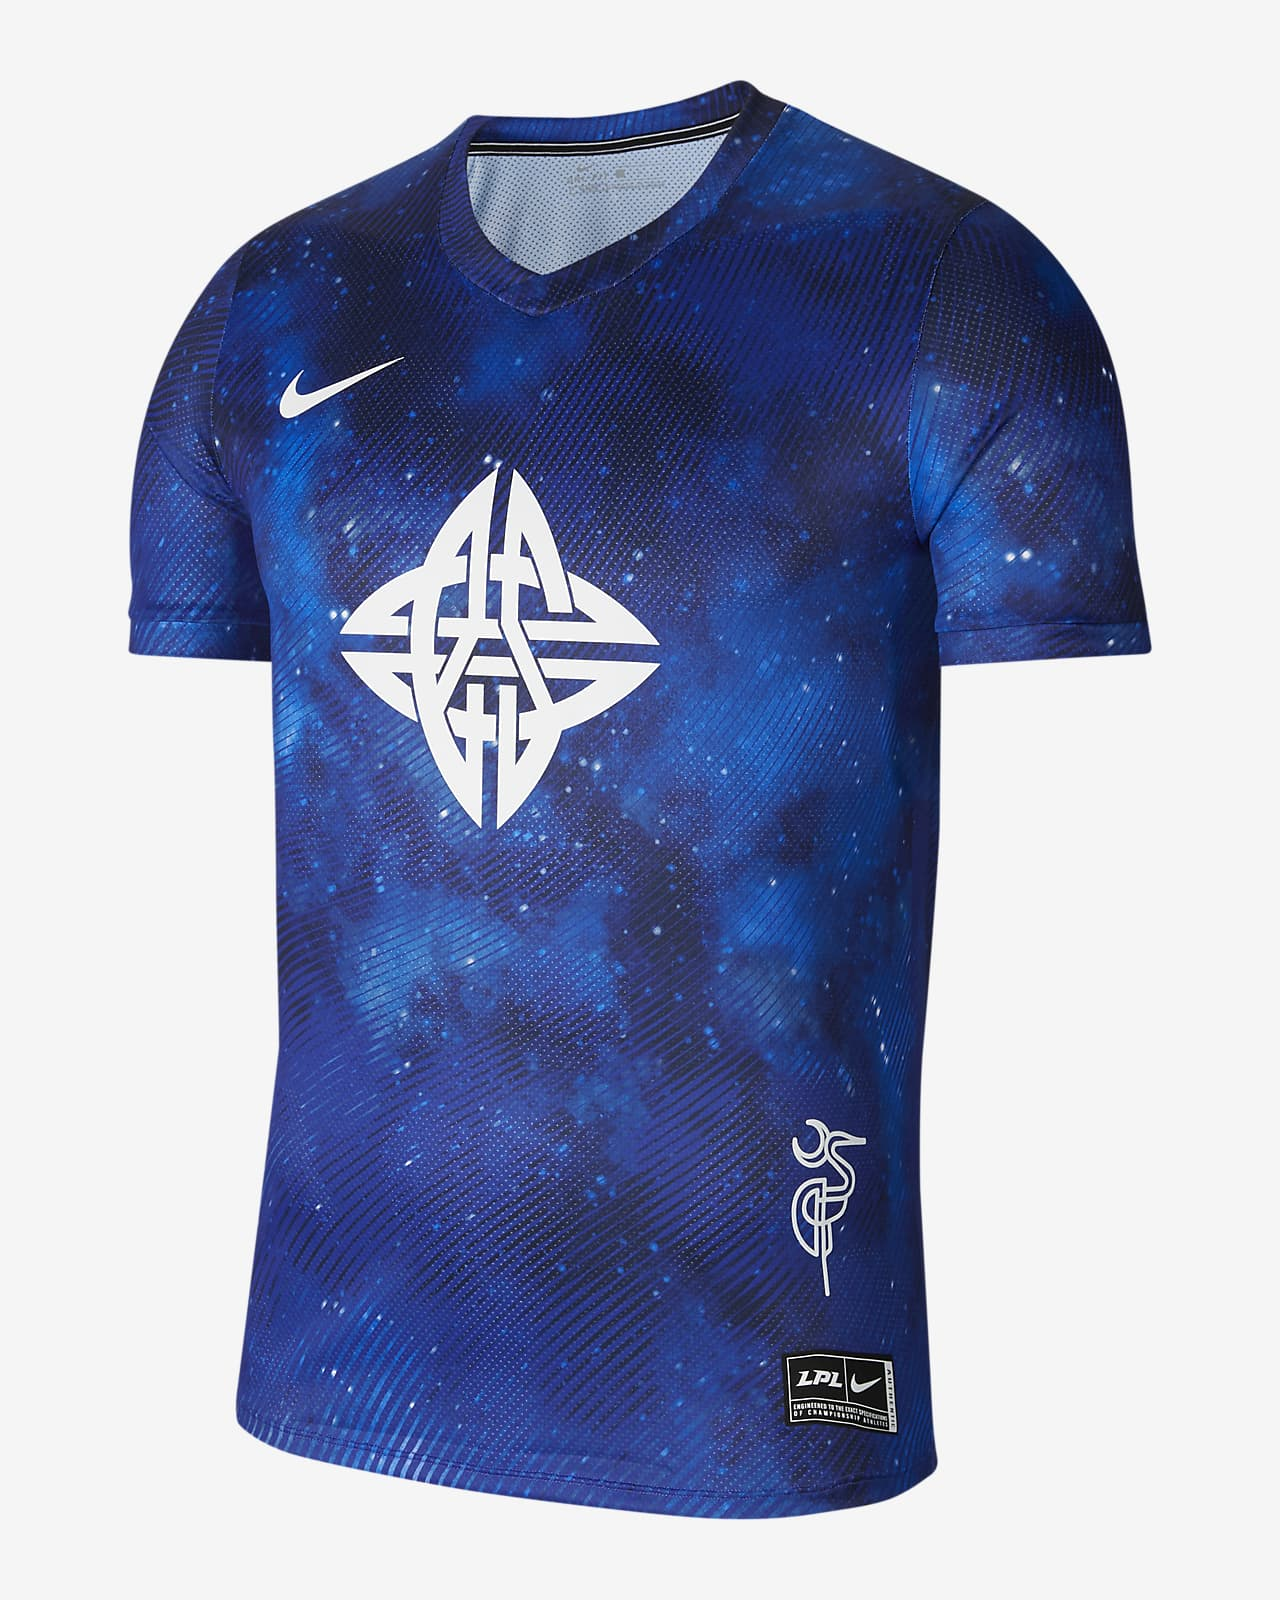 Nike x LPL eStar 男子比赛服